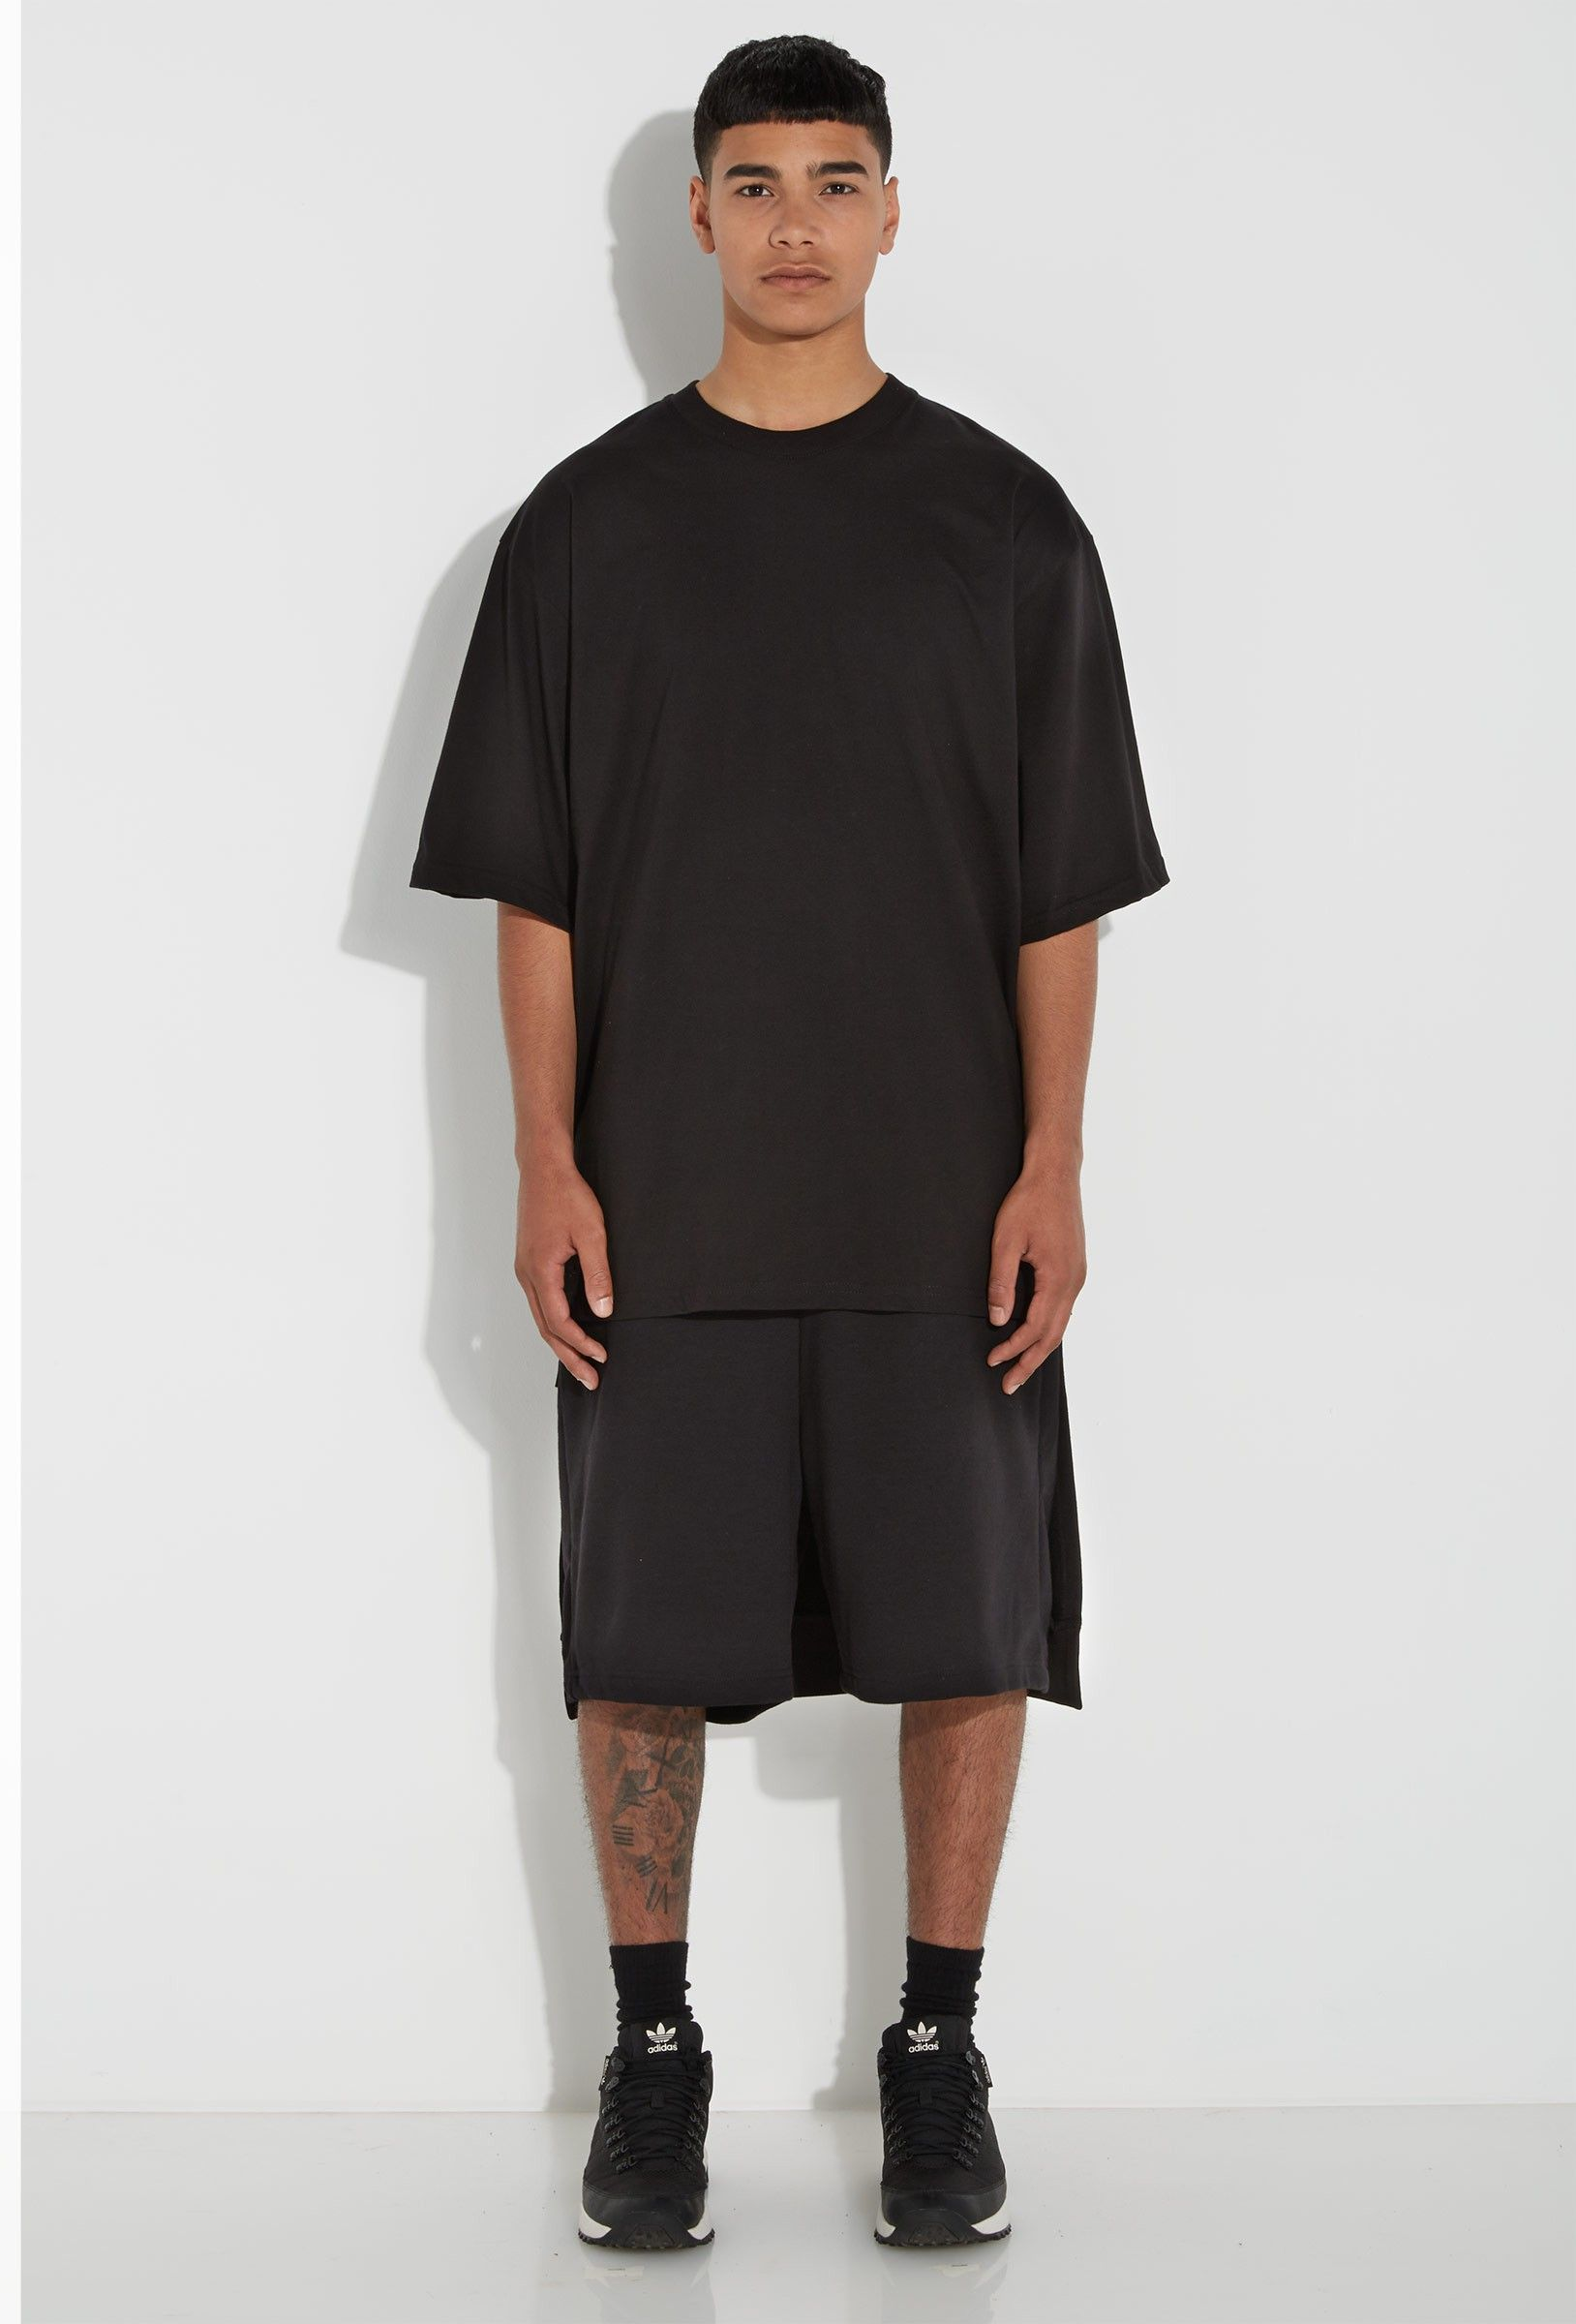 Oversized black t shirt - Mono Black Oversized T Shirt